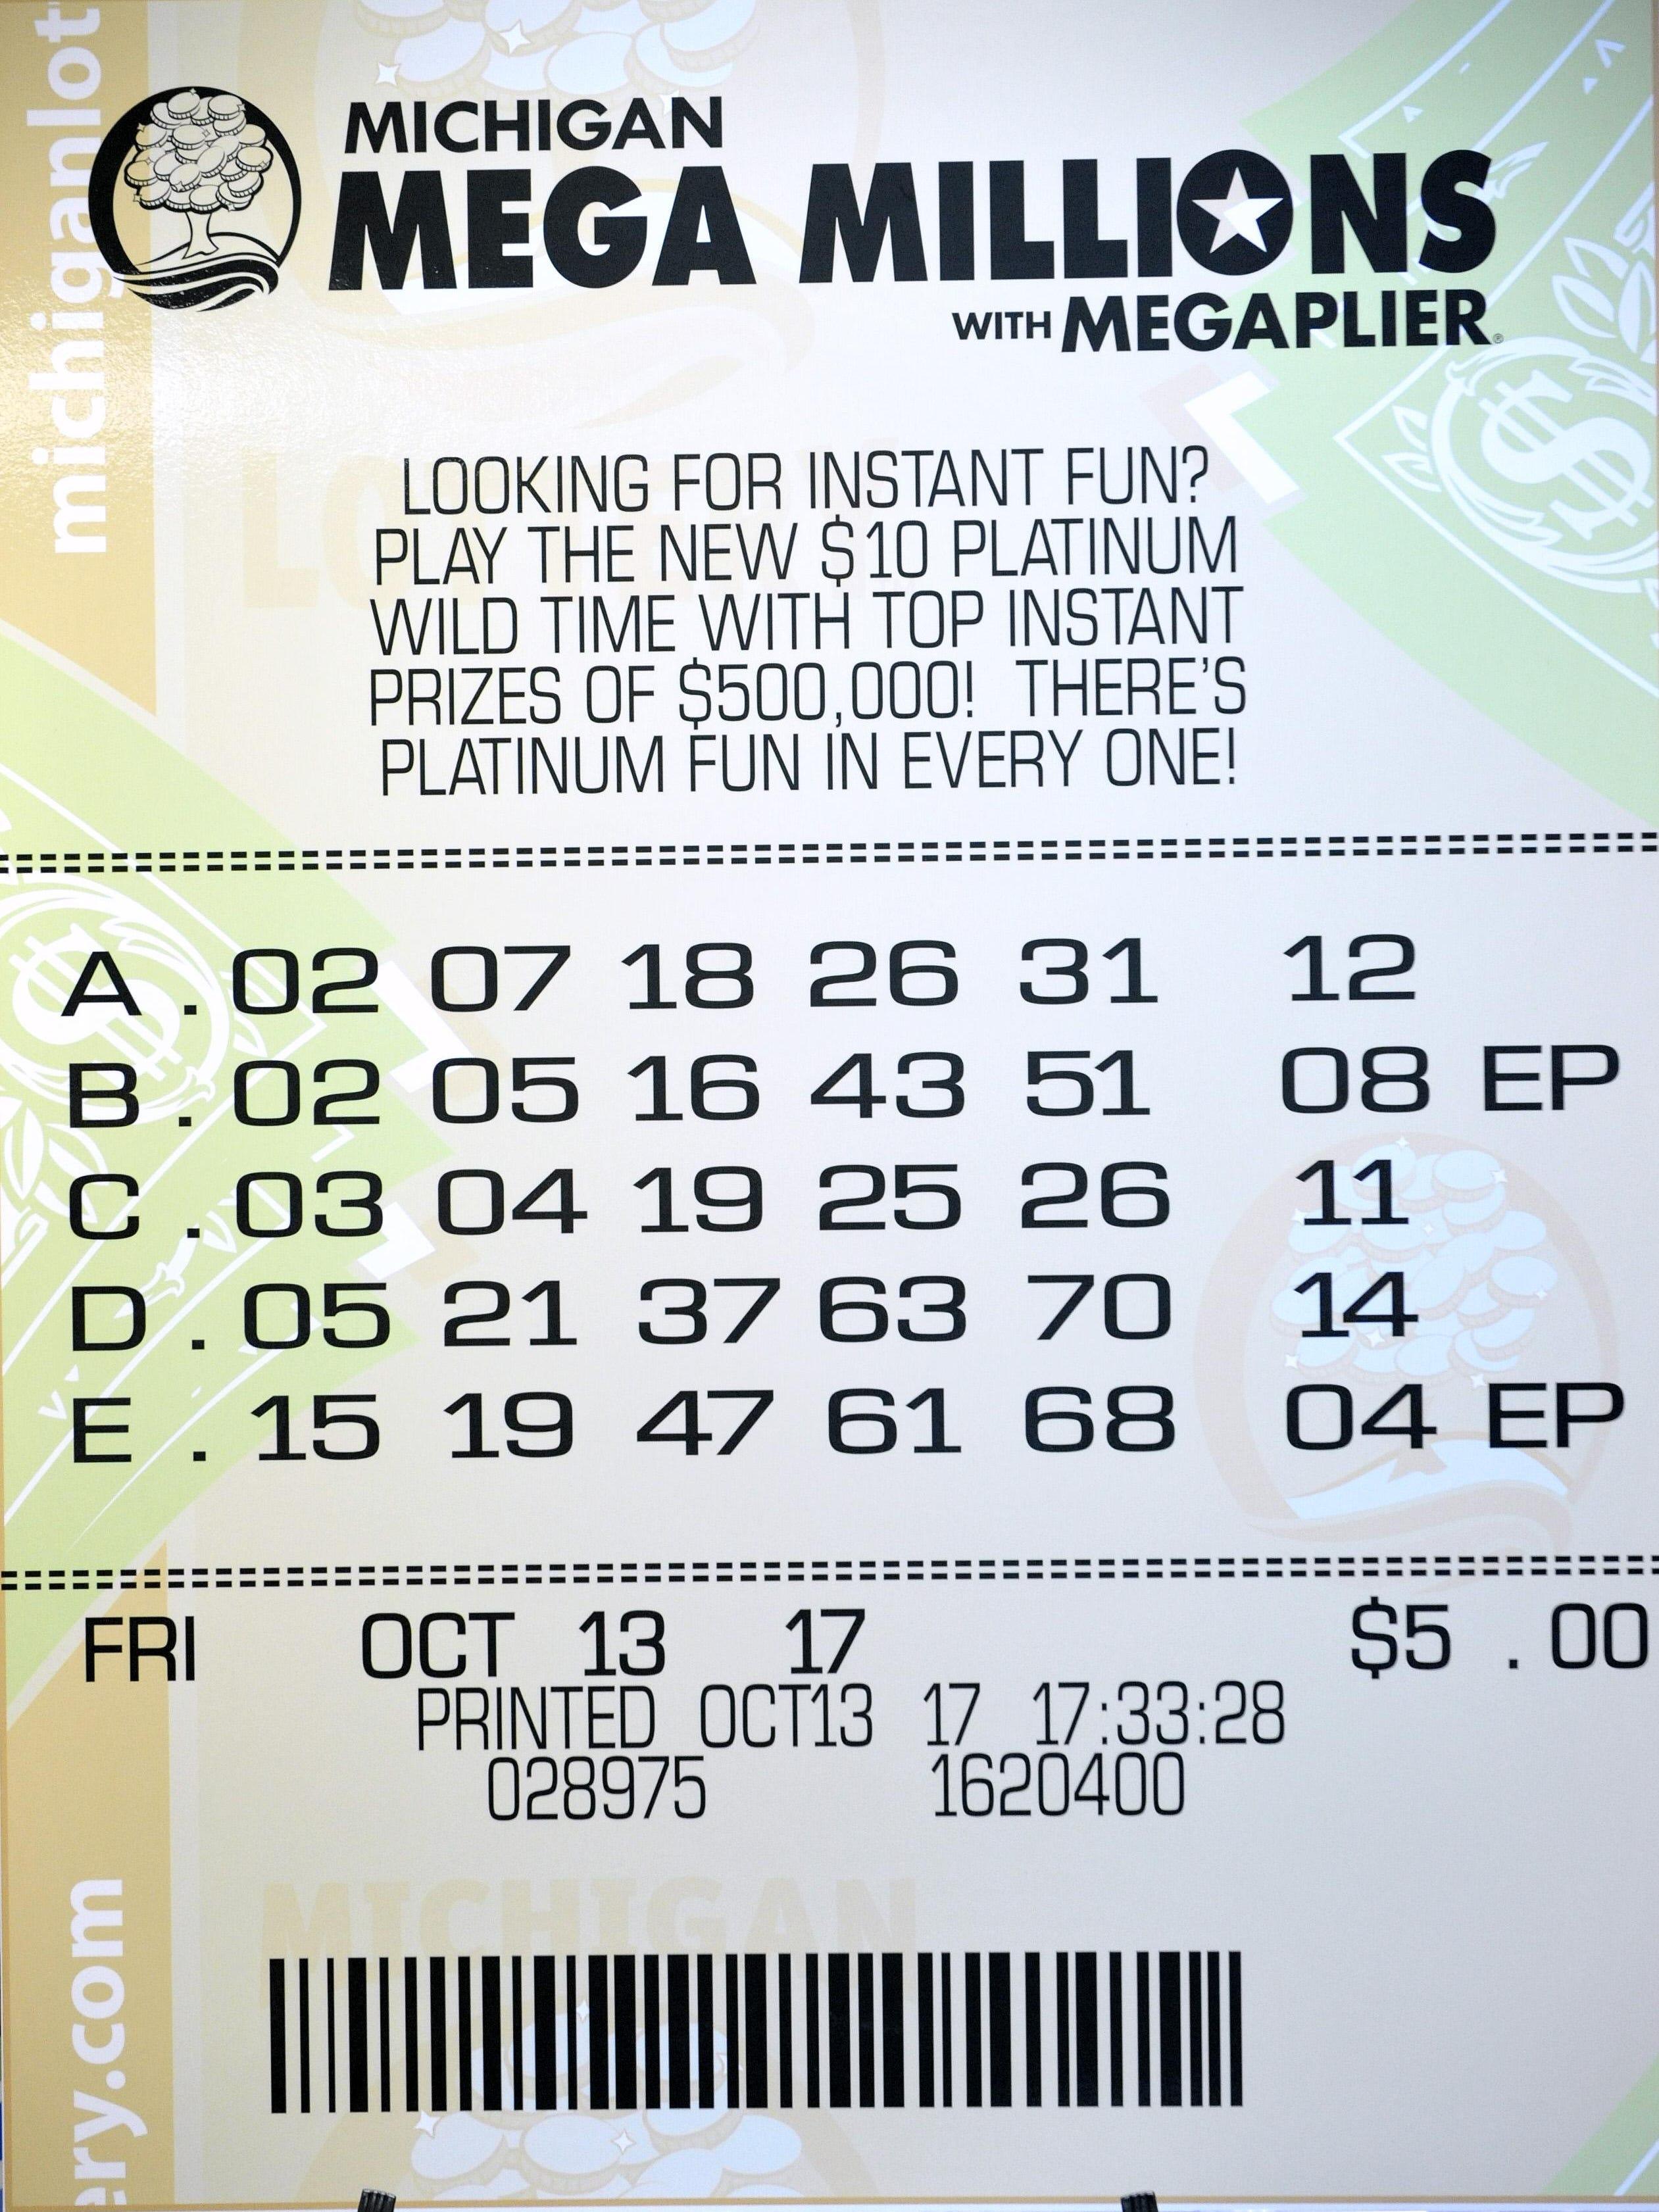 1m Mega Millions Ticket Sold In Wayne Co